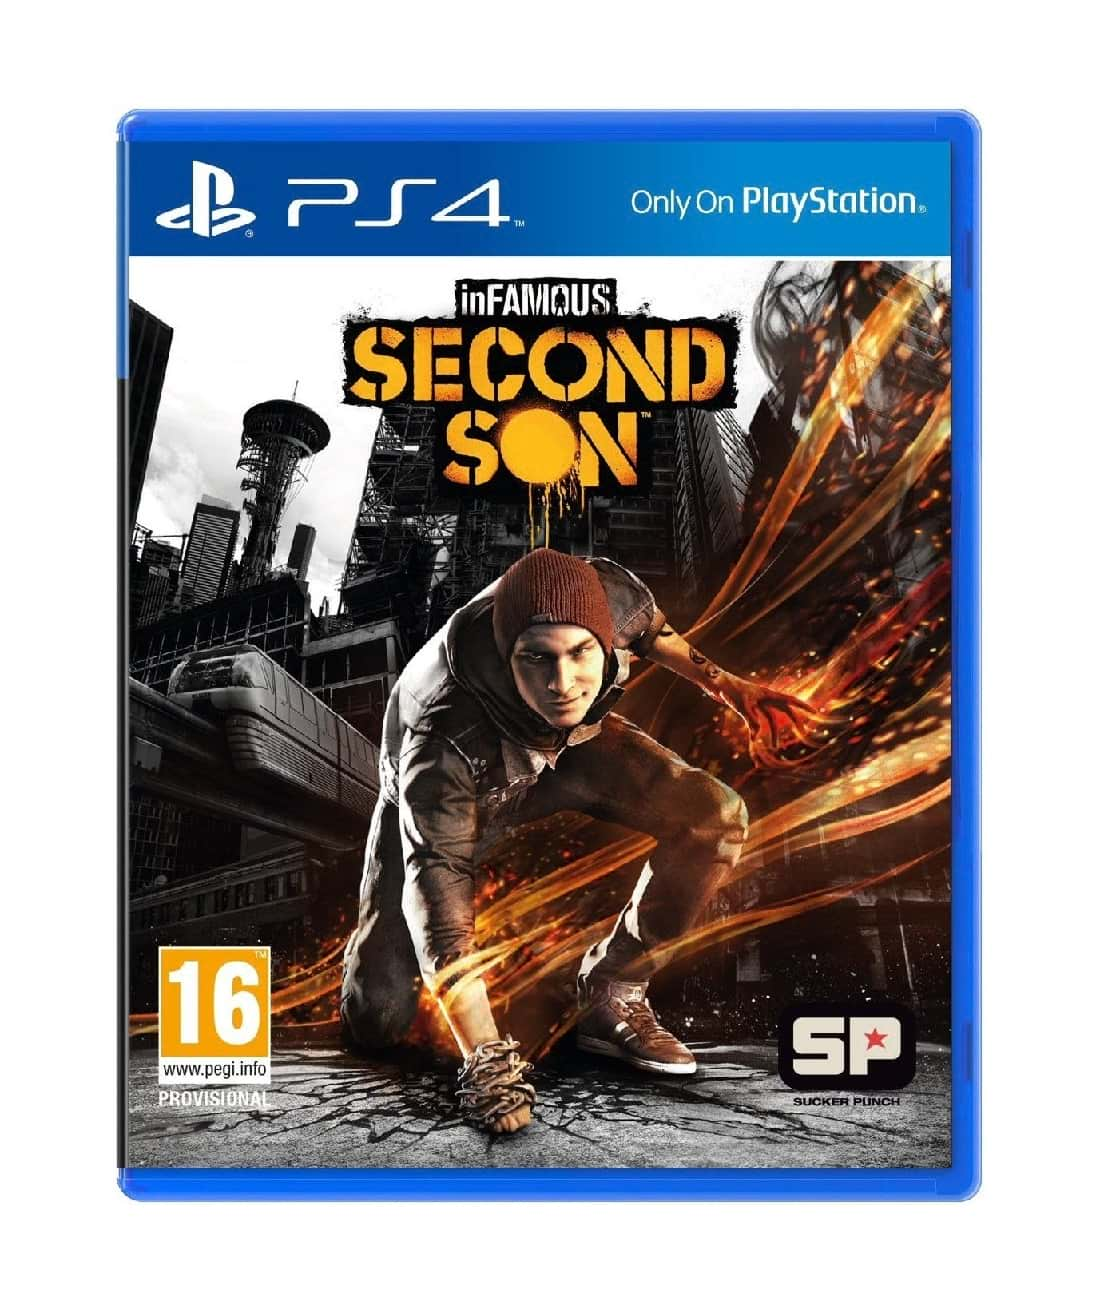 Infamous Second Son™